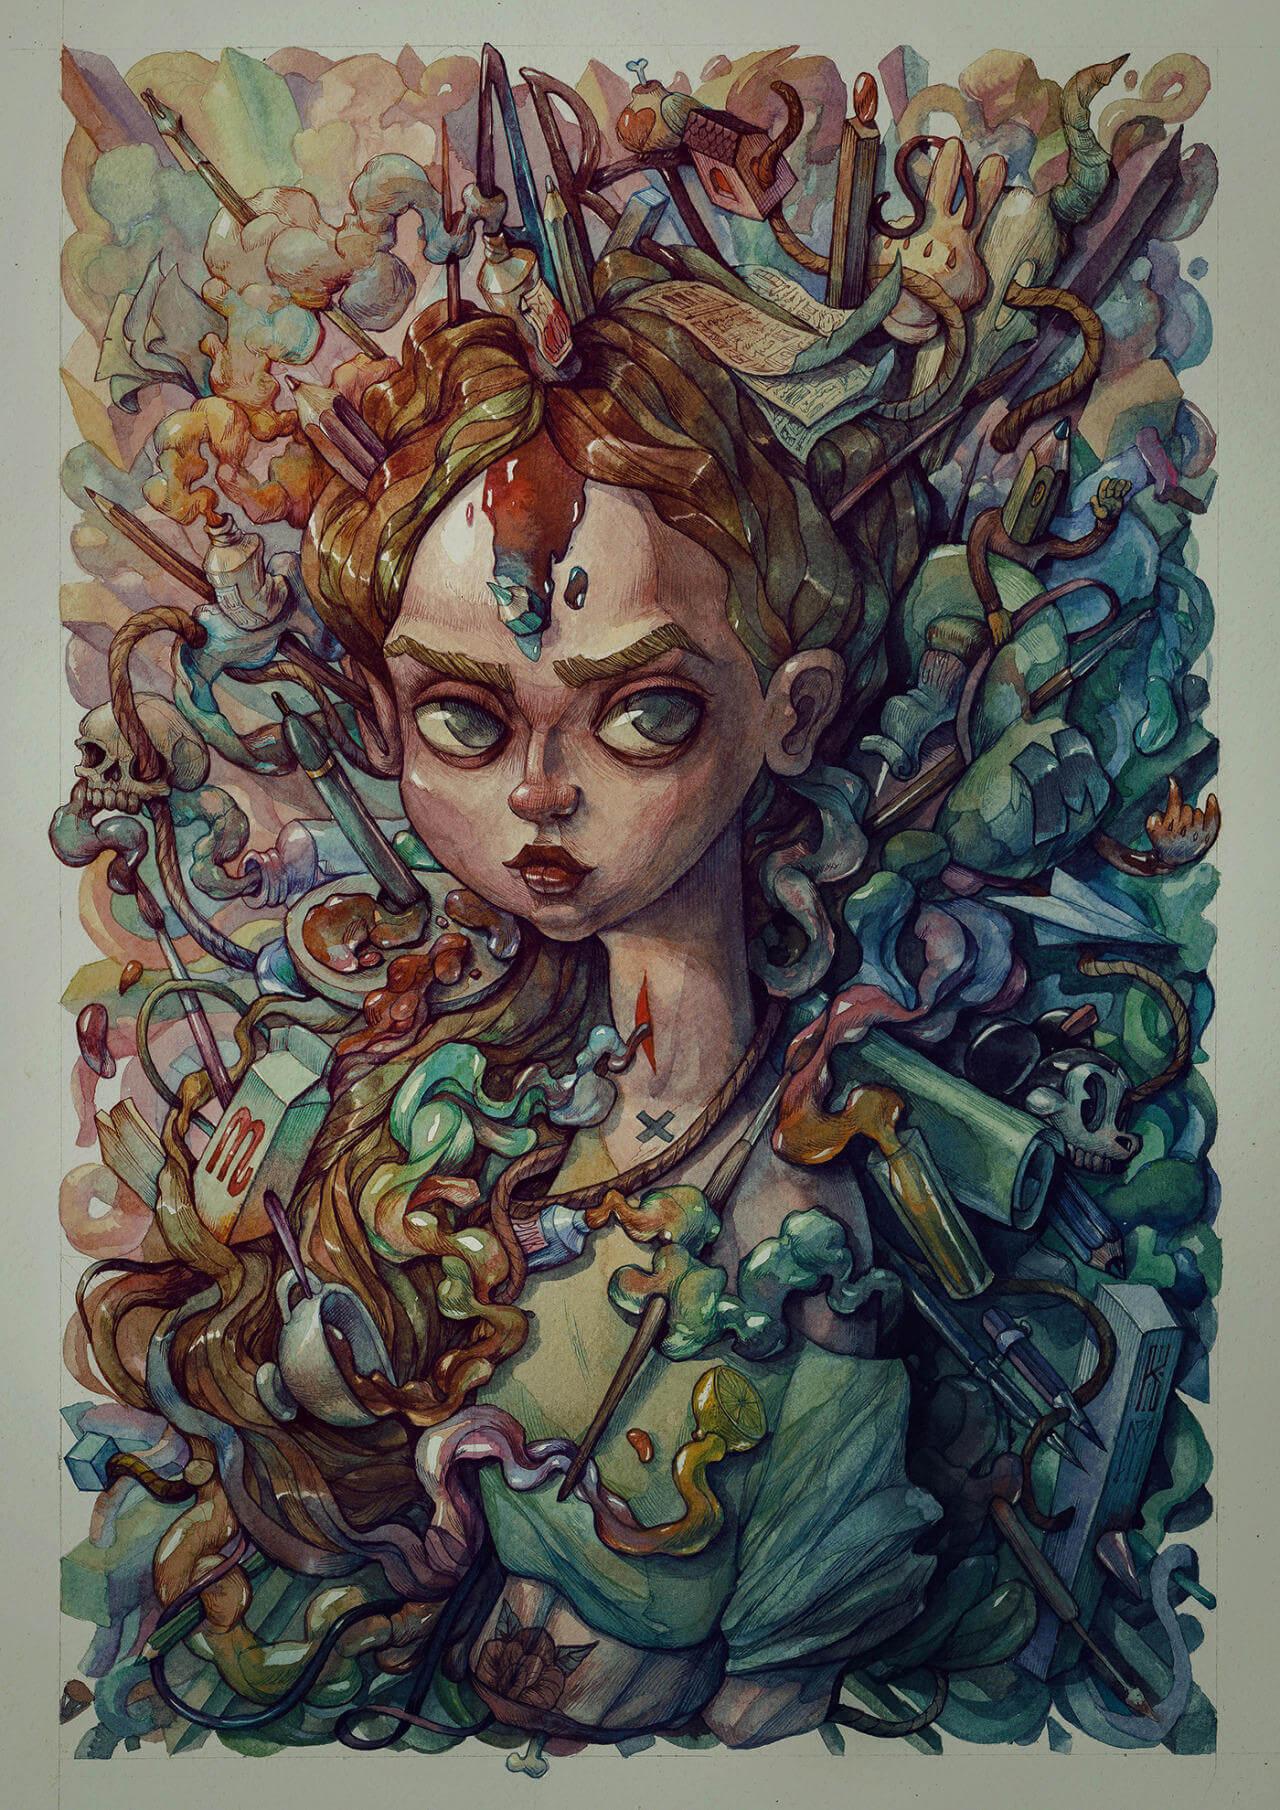 marija tiurina illustration 9